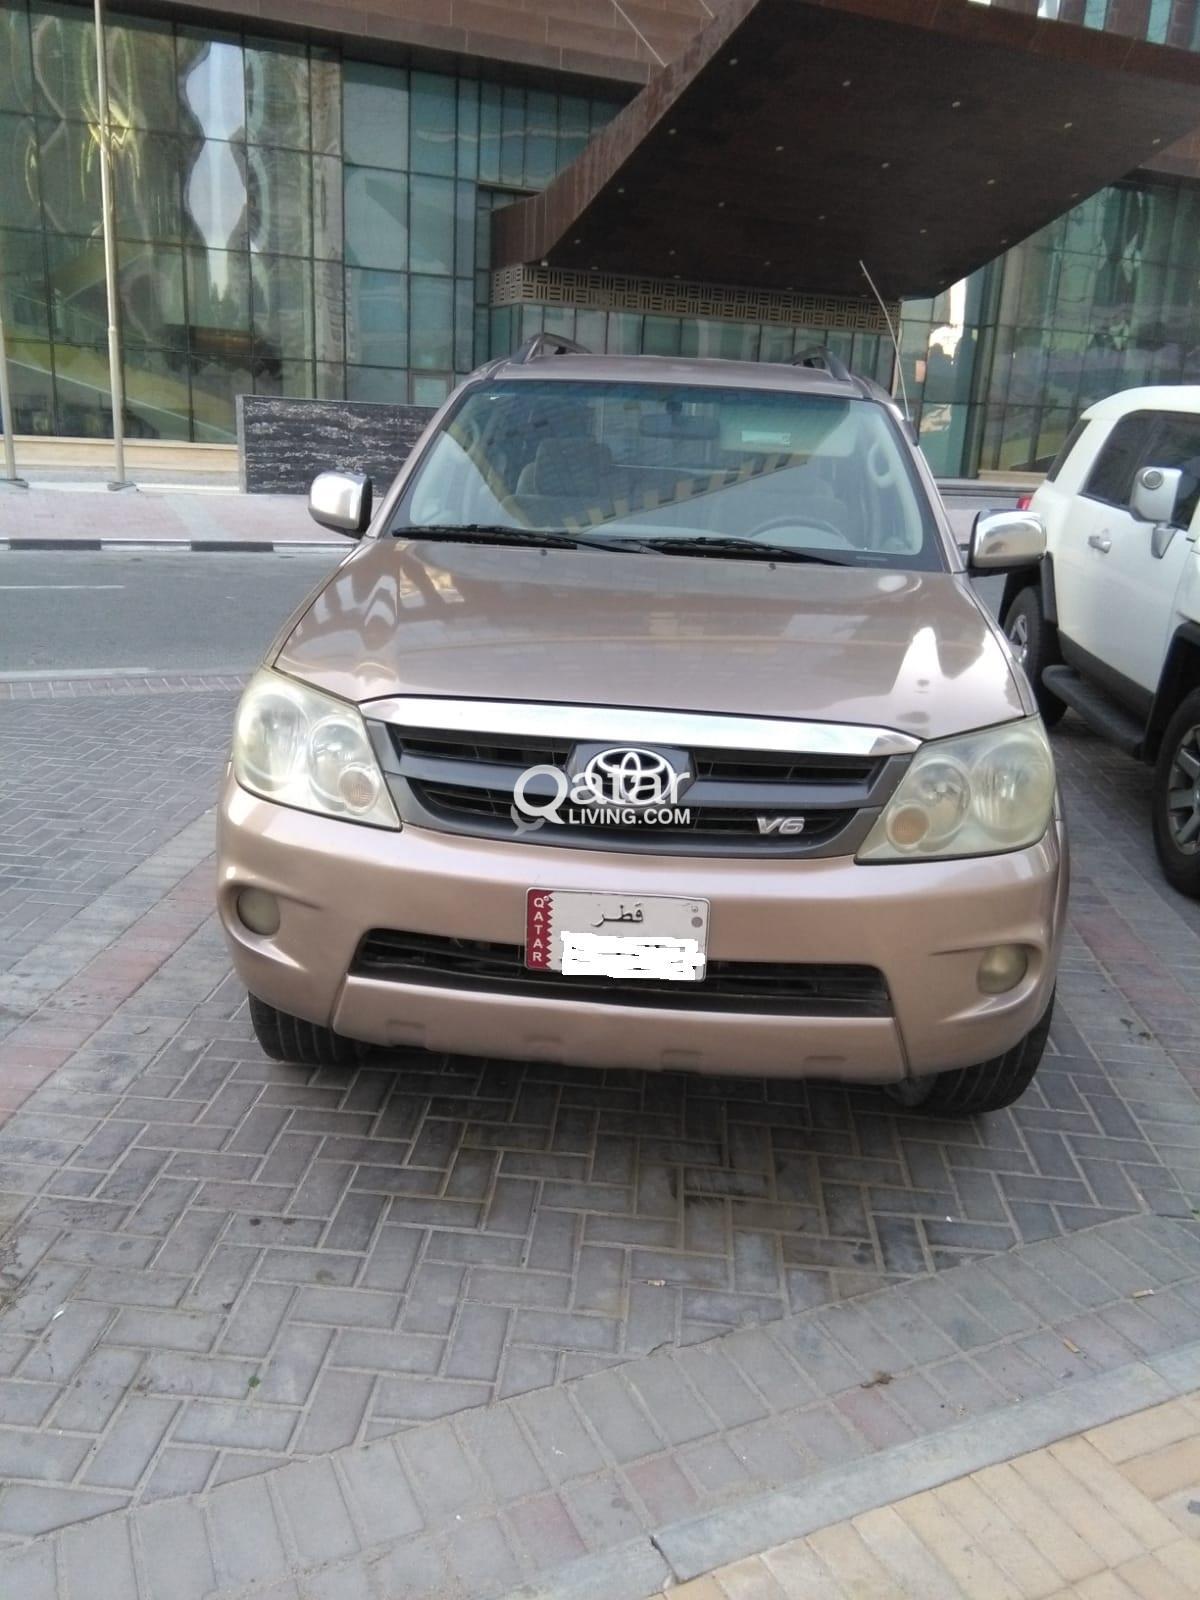 Car For Sale | Qatar Living